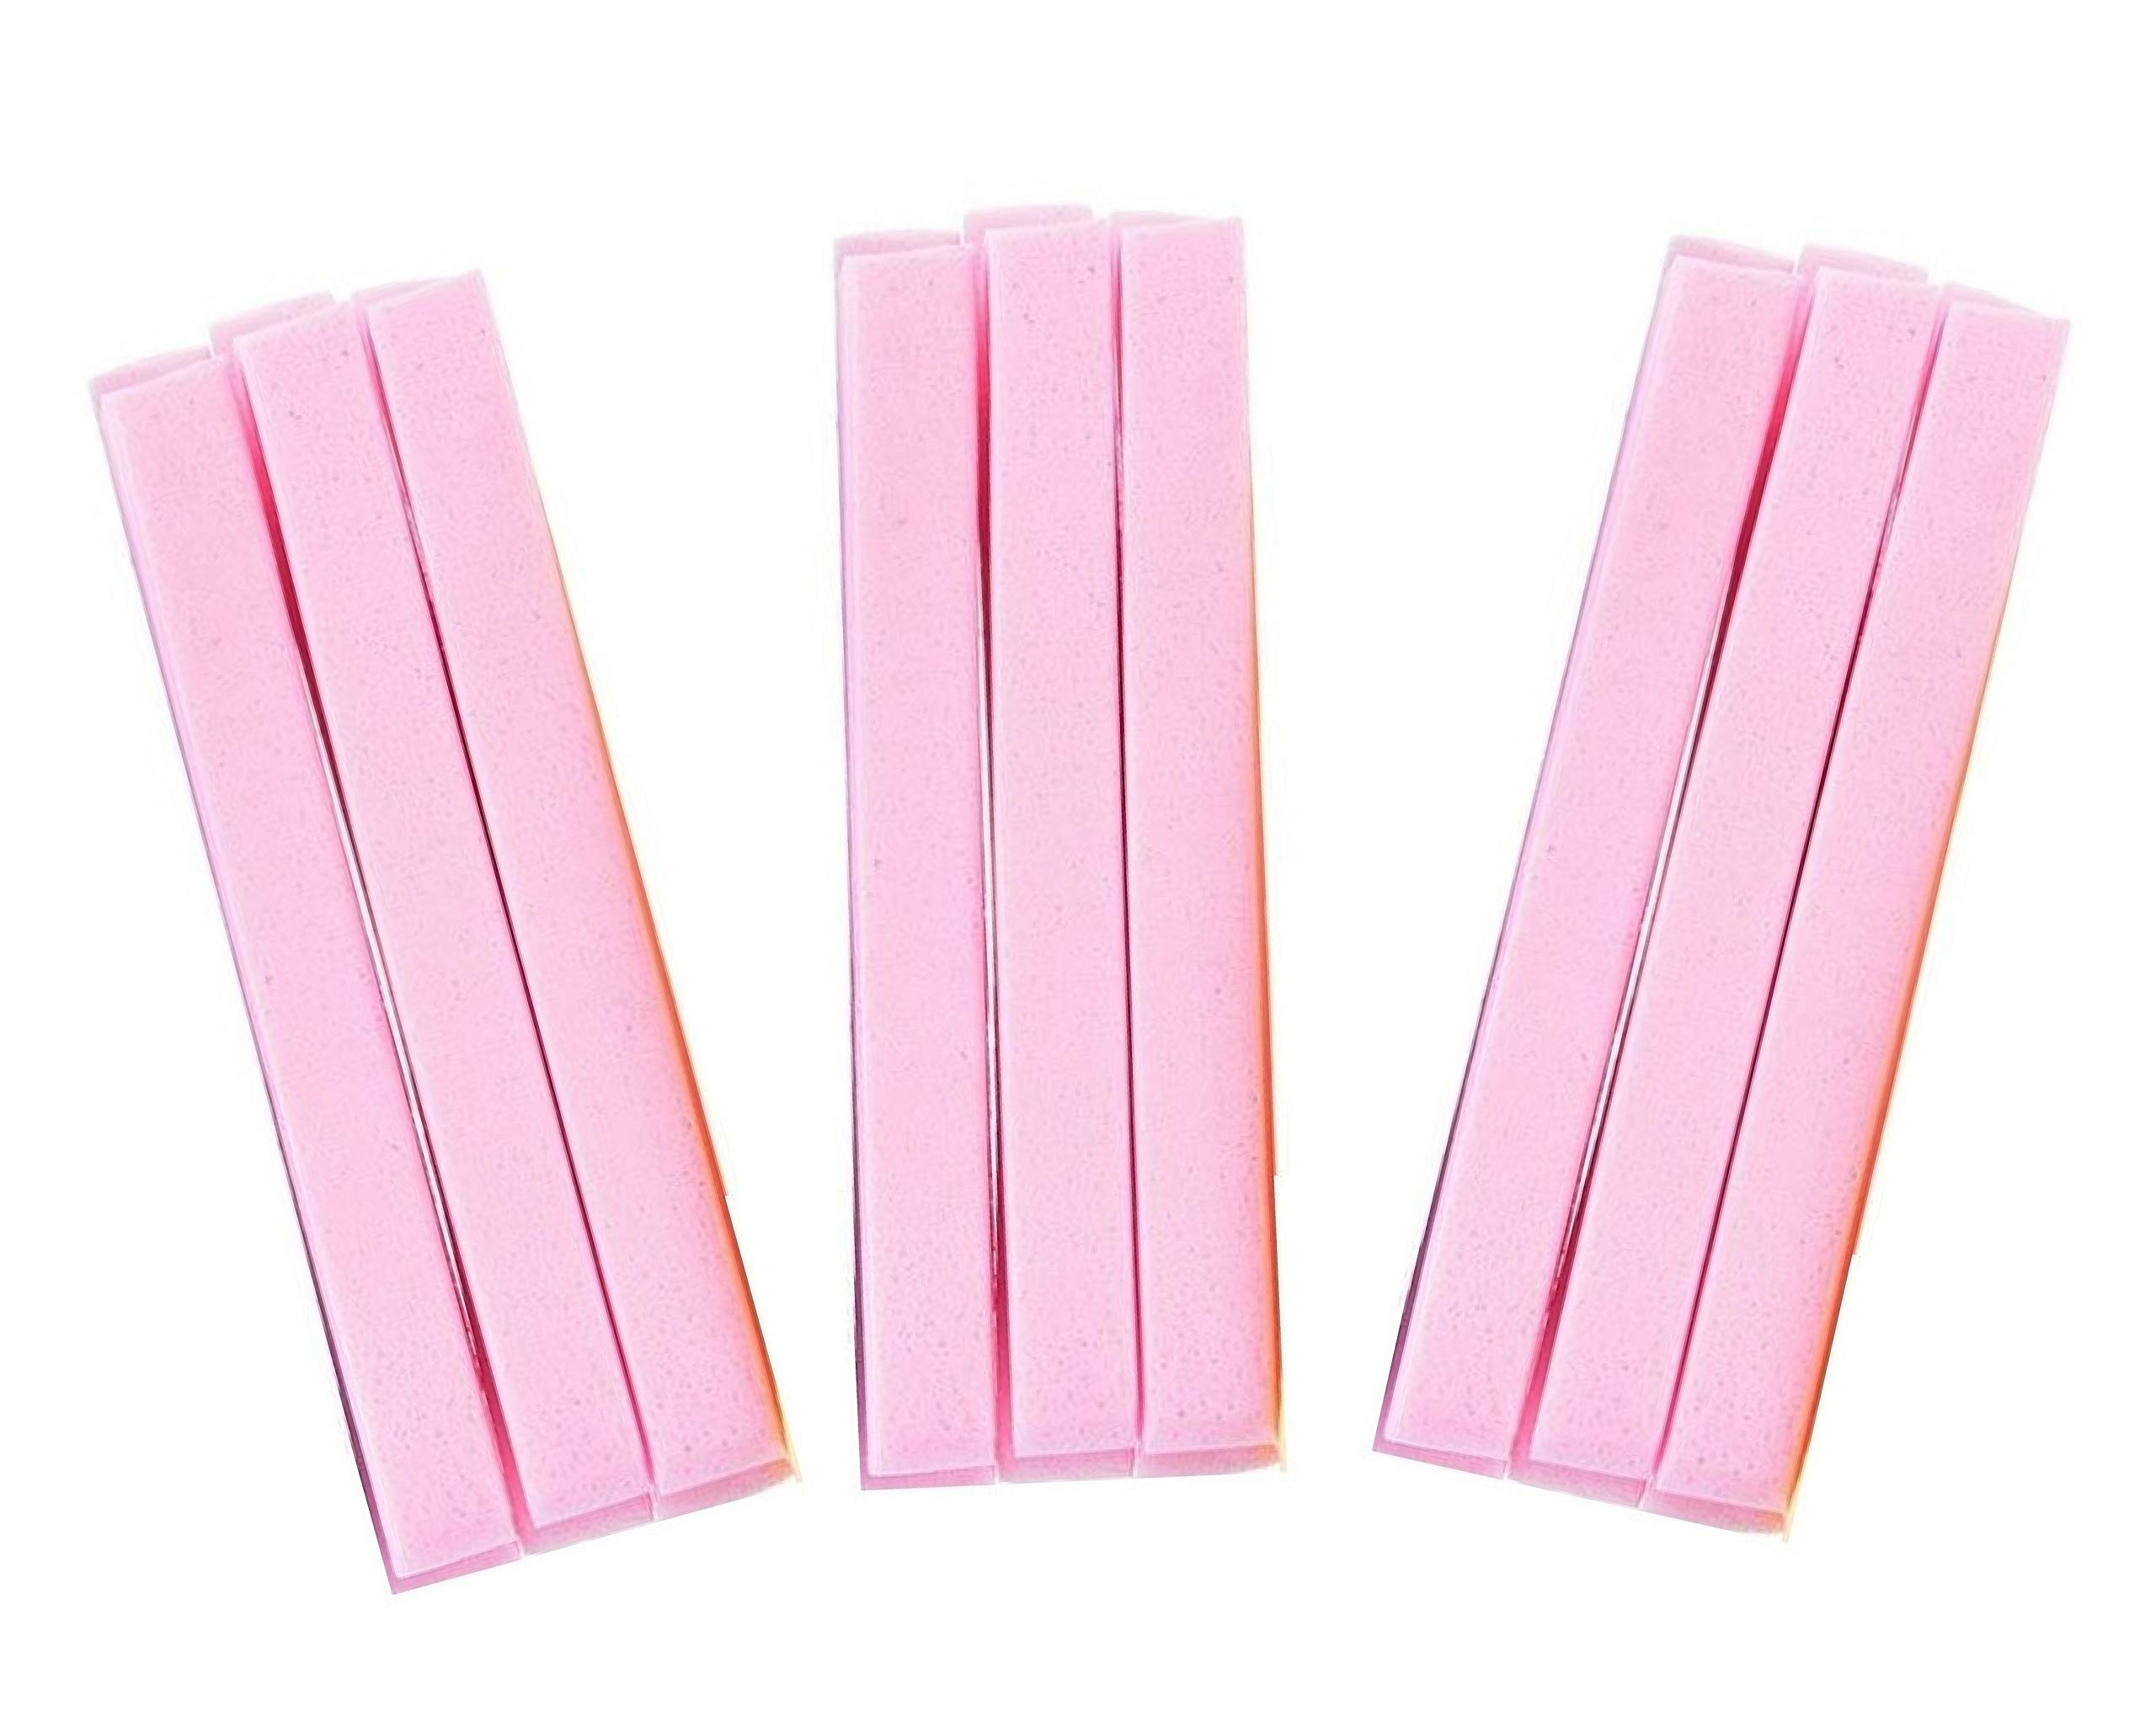 Huini Compressed Salon Spa Facial Cleansing Sponge Sticks, Natural (240 Count) (Pink) CD- 114 x 20